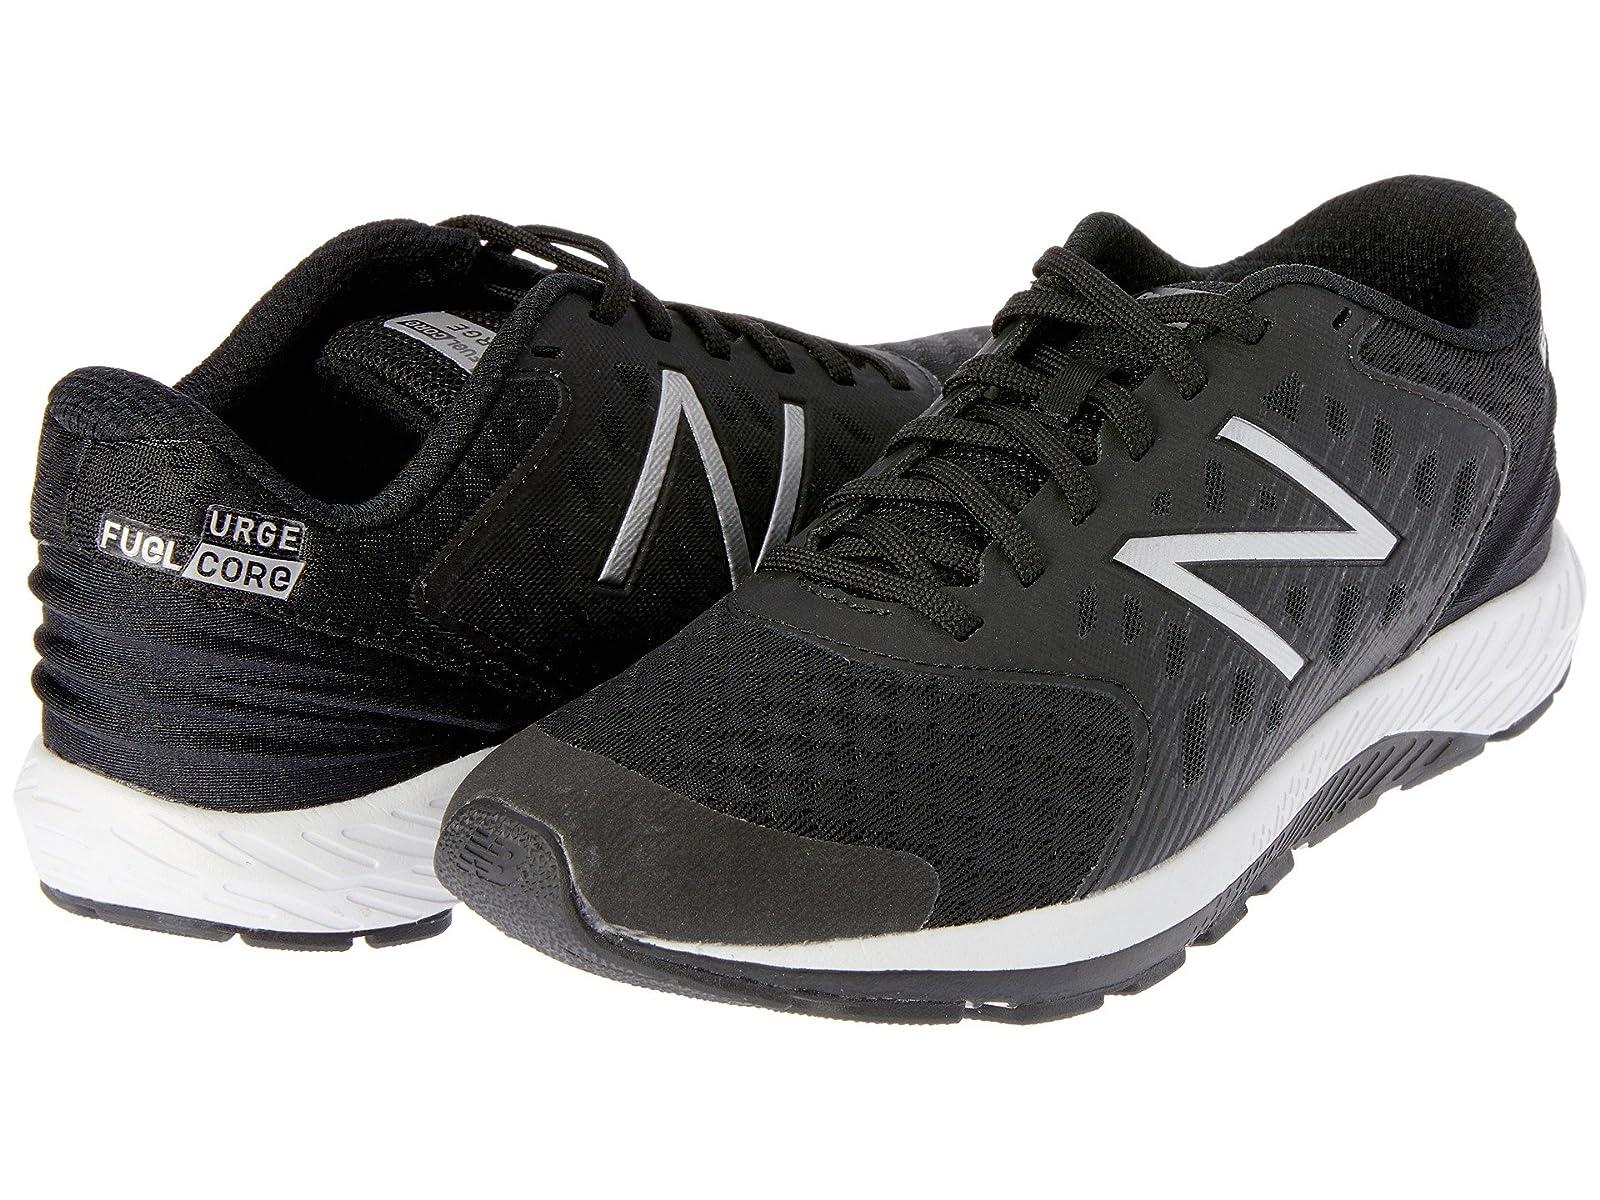 New Balance Kids Vazee Urge (Little Kid/Big Kid)Cheap and distinctive eye-catching shoes